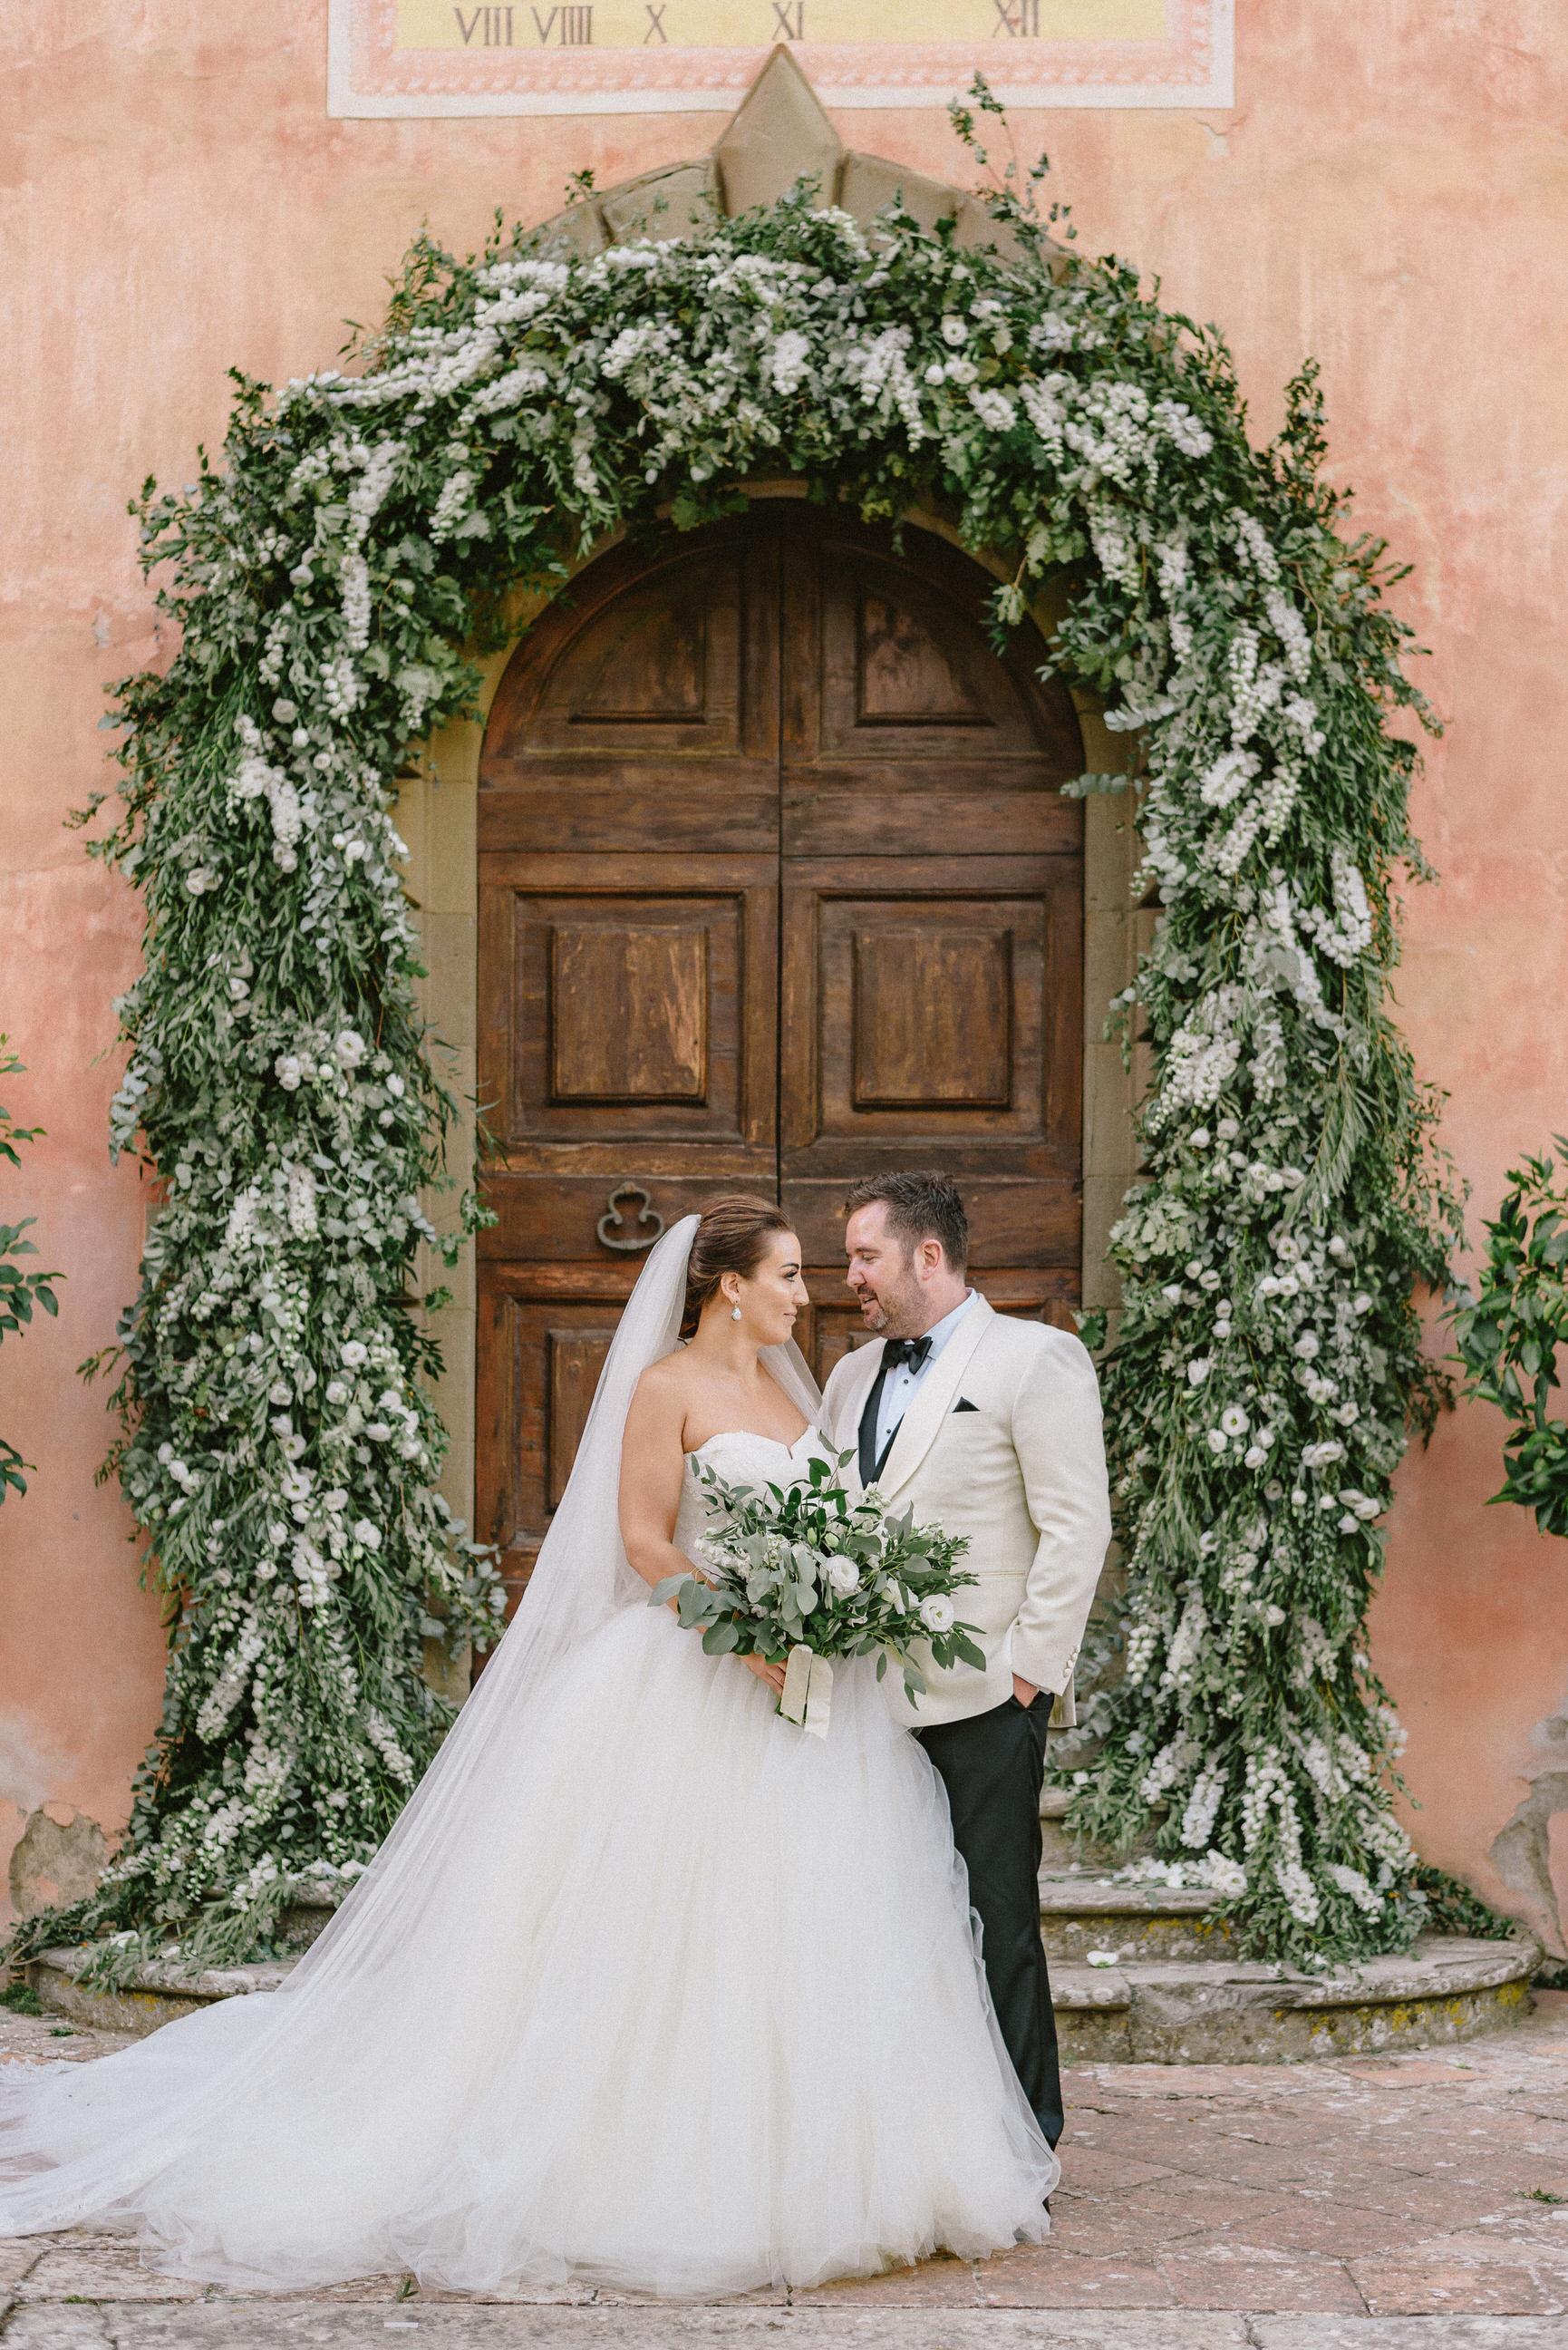 Luxury italy wedding planner Vignamaggio ceremony arch